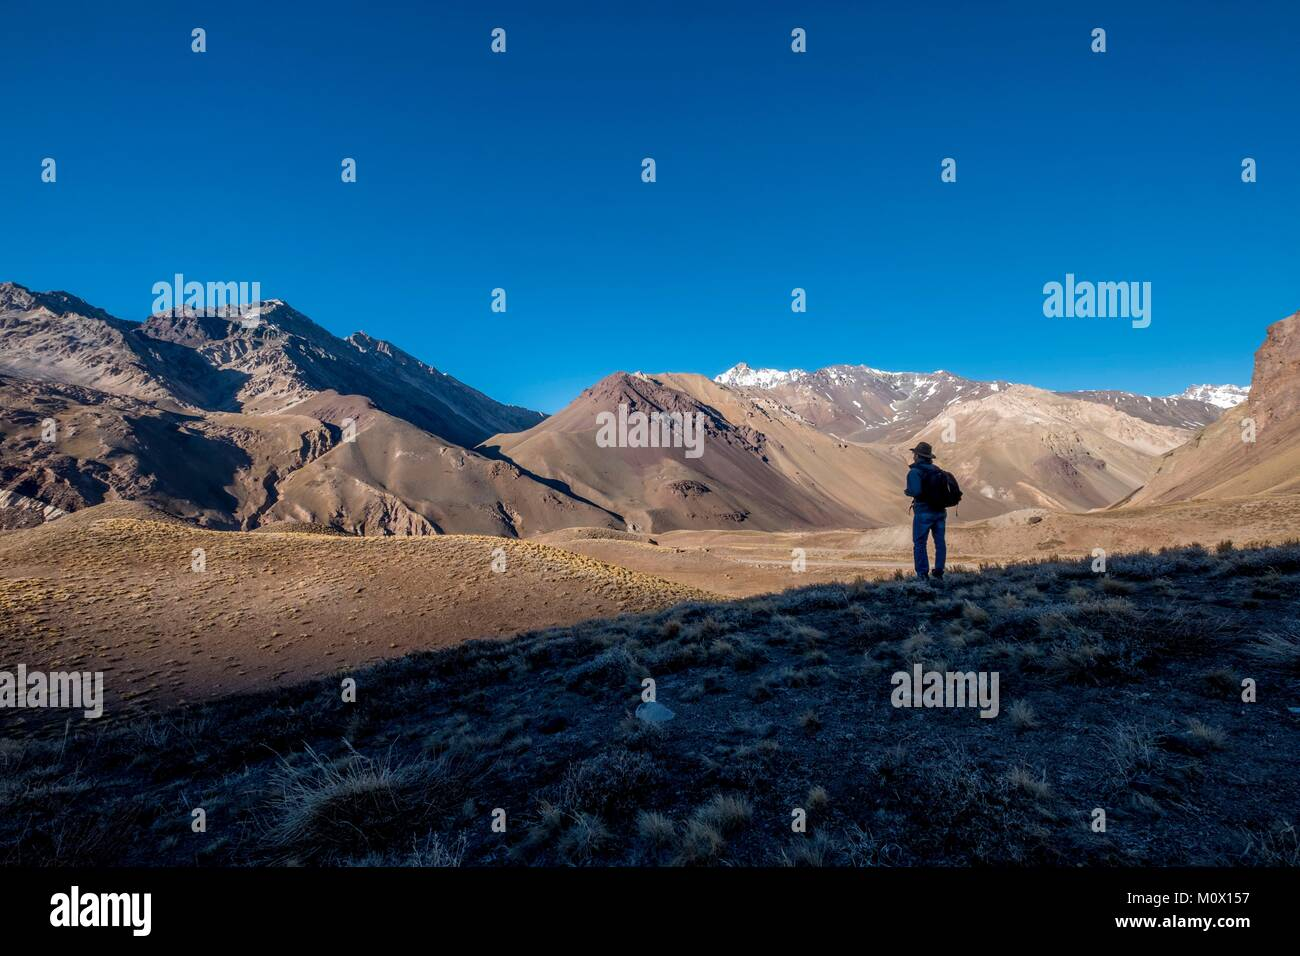 Argentinien, Mendoza, Provinz, Aconcagua Provincial Park Stockbild